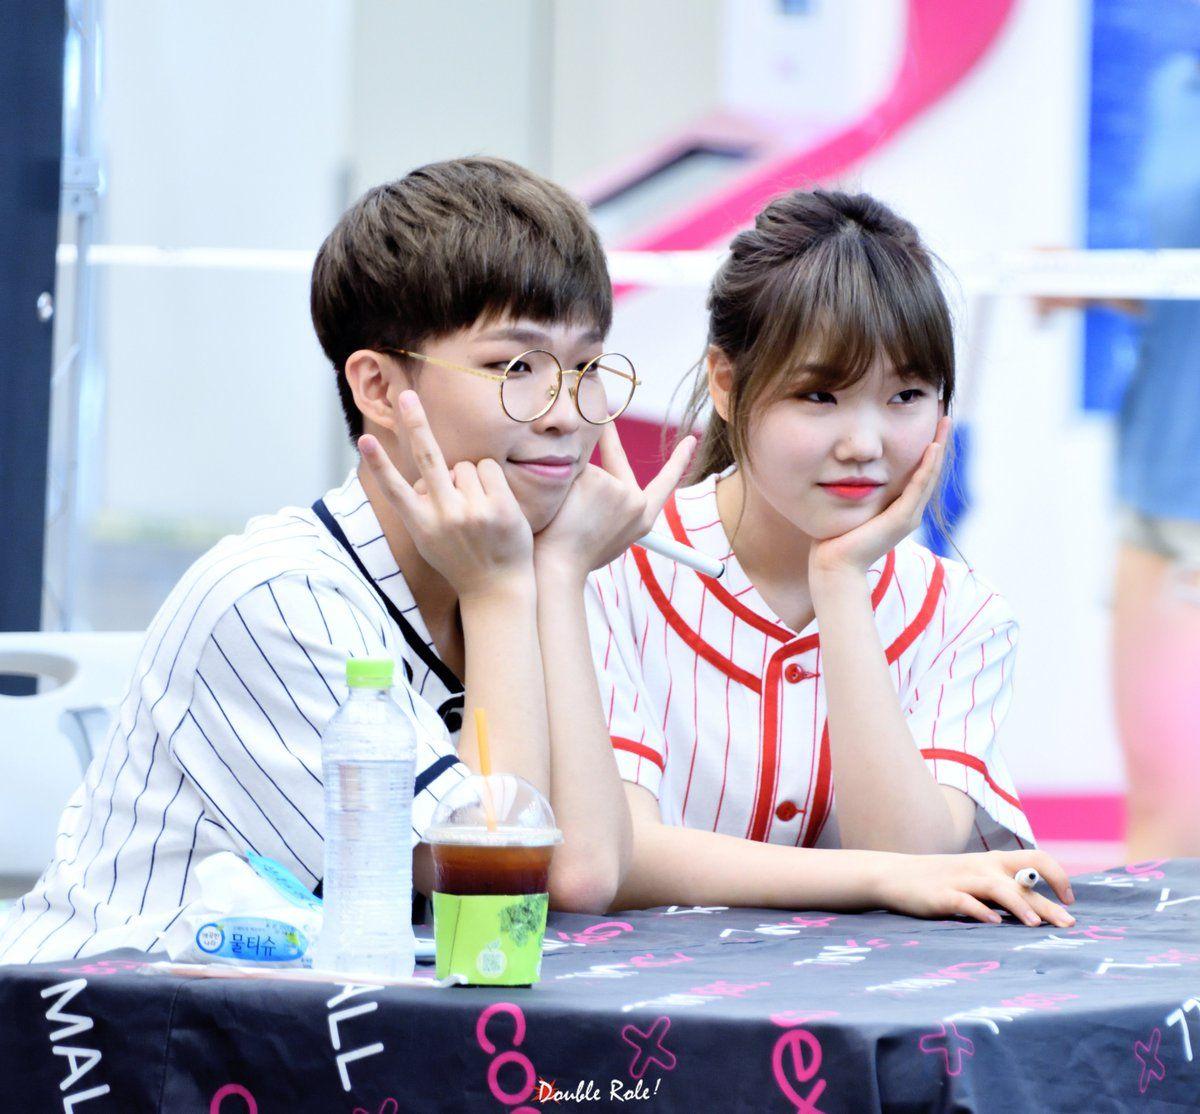 Akmu Is Love Akdong Musician Kpop Groups Yg Entertainment